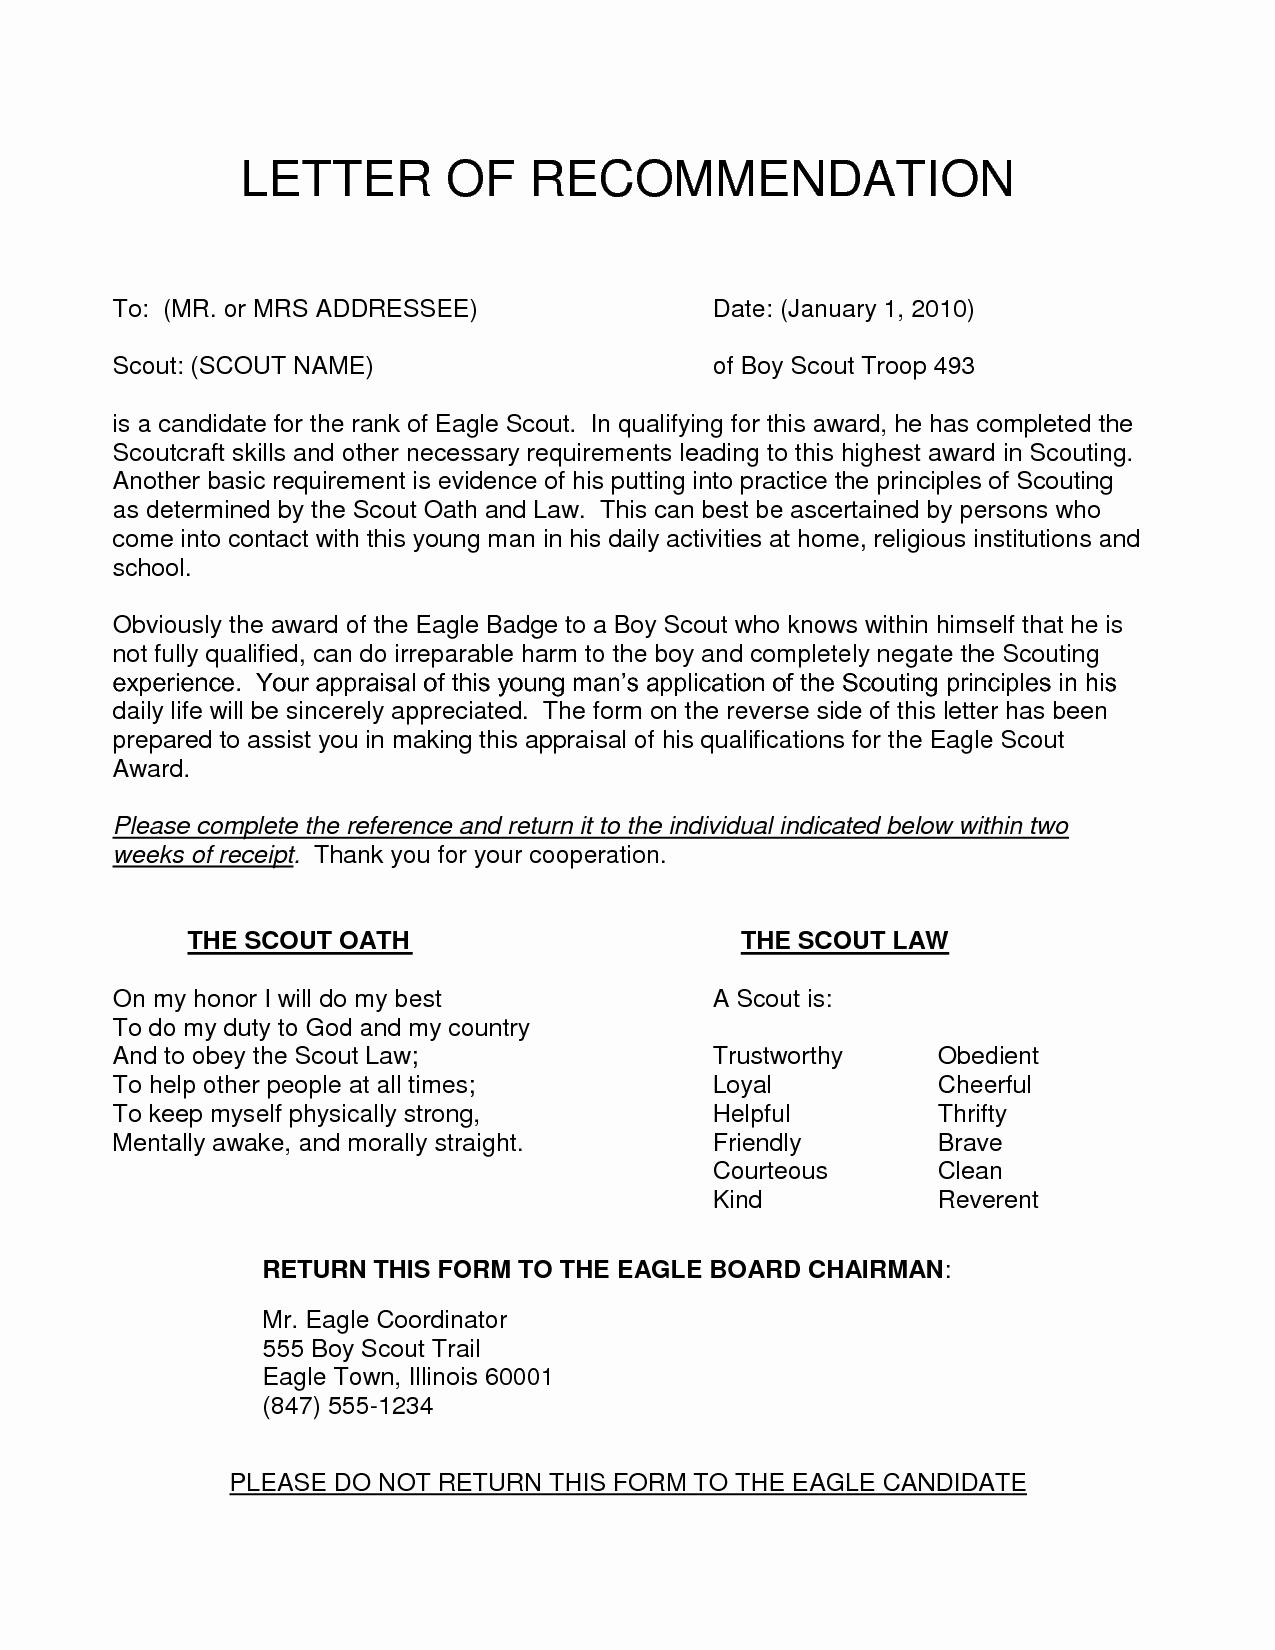 Boy Scout Letter Of Recommendation Beautiful Content 2016 10 Eagle Scout